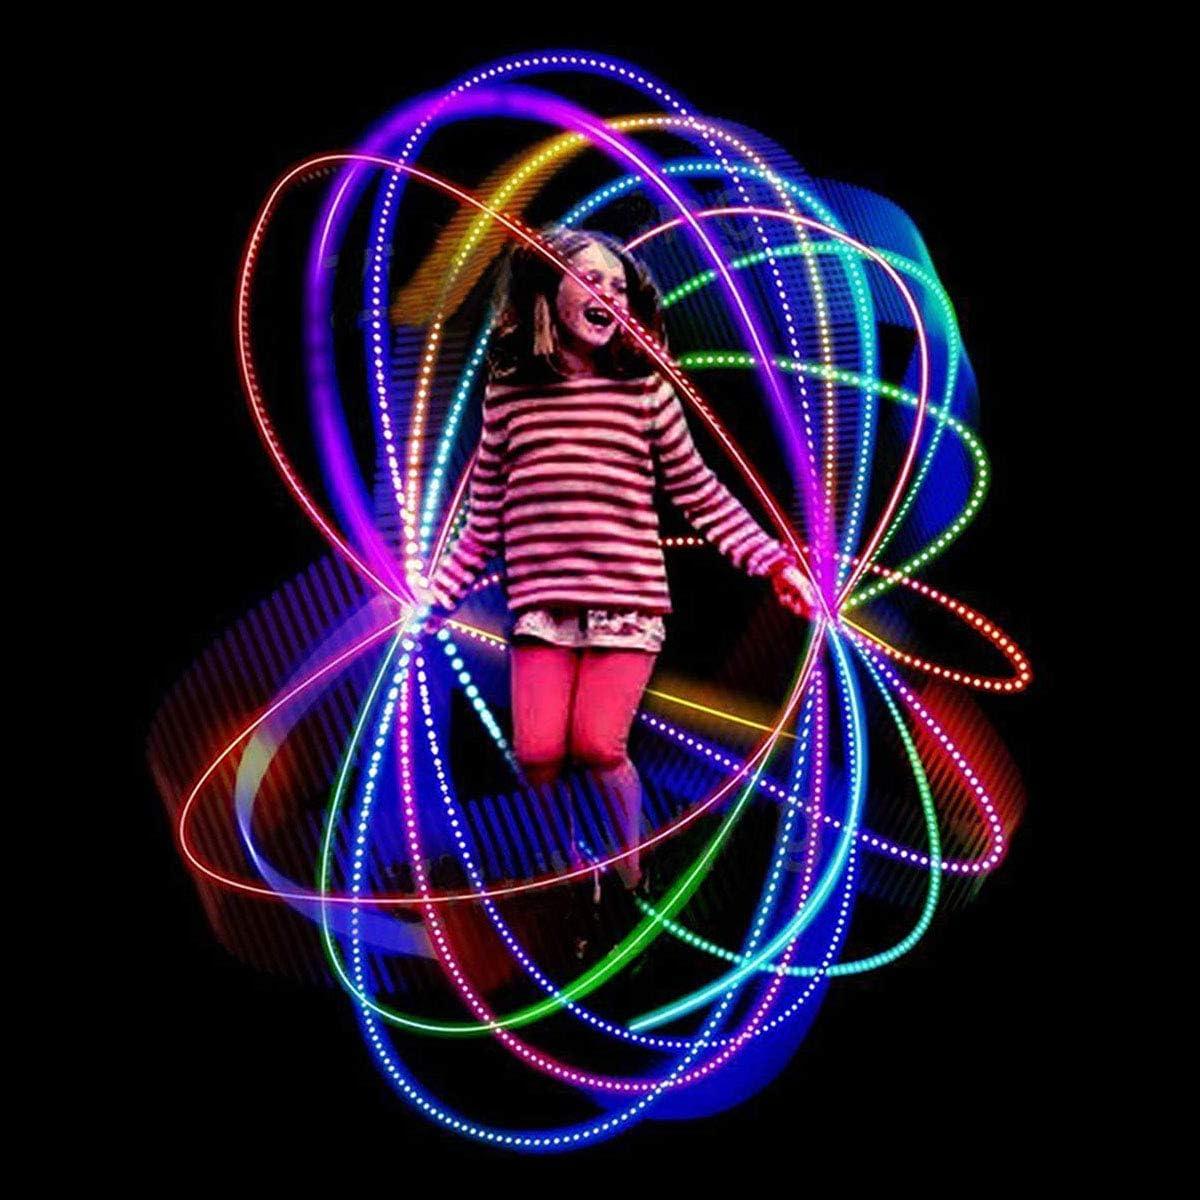 DEL Corde à sauter Fitness avec plaisir violet brillant et néons DEL Corde